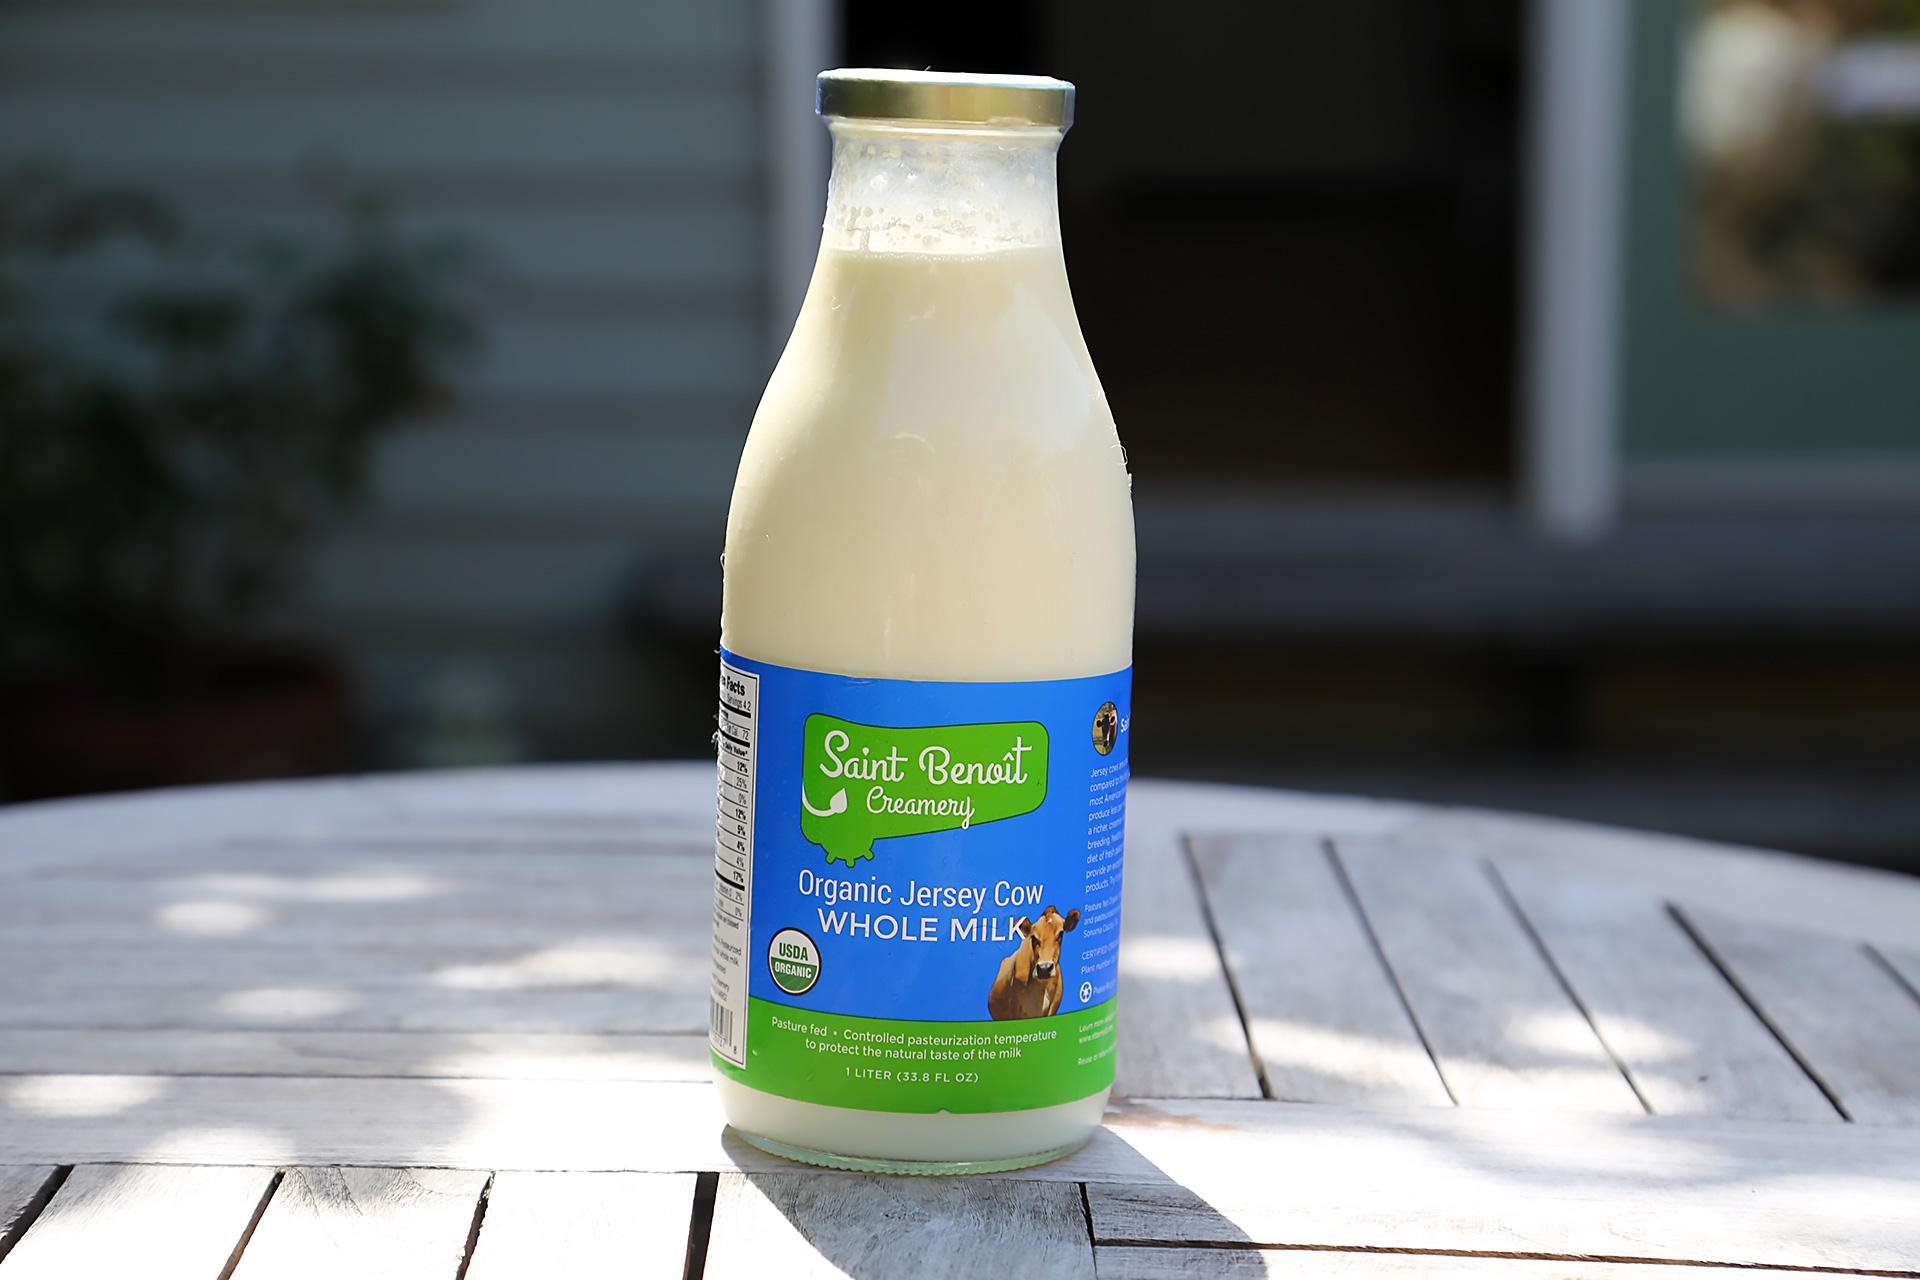 Saint Benoît Organic Jersey Cow Whole Milk